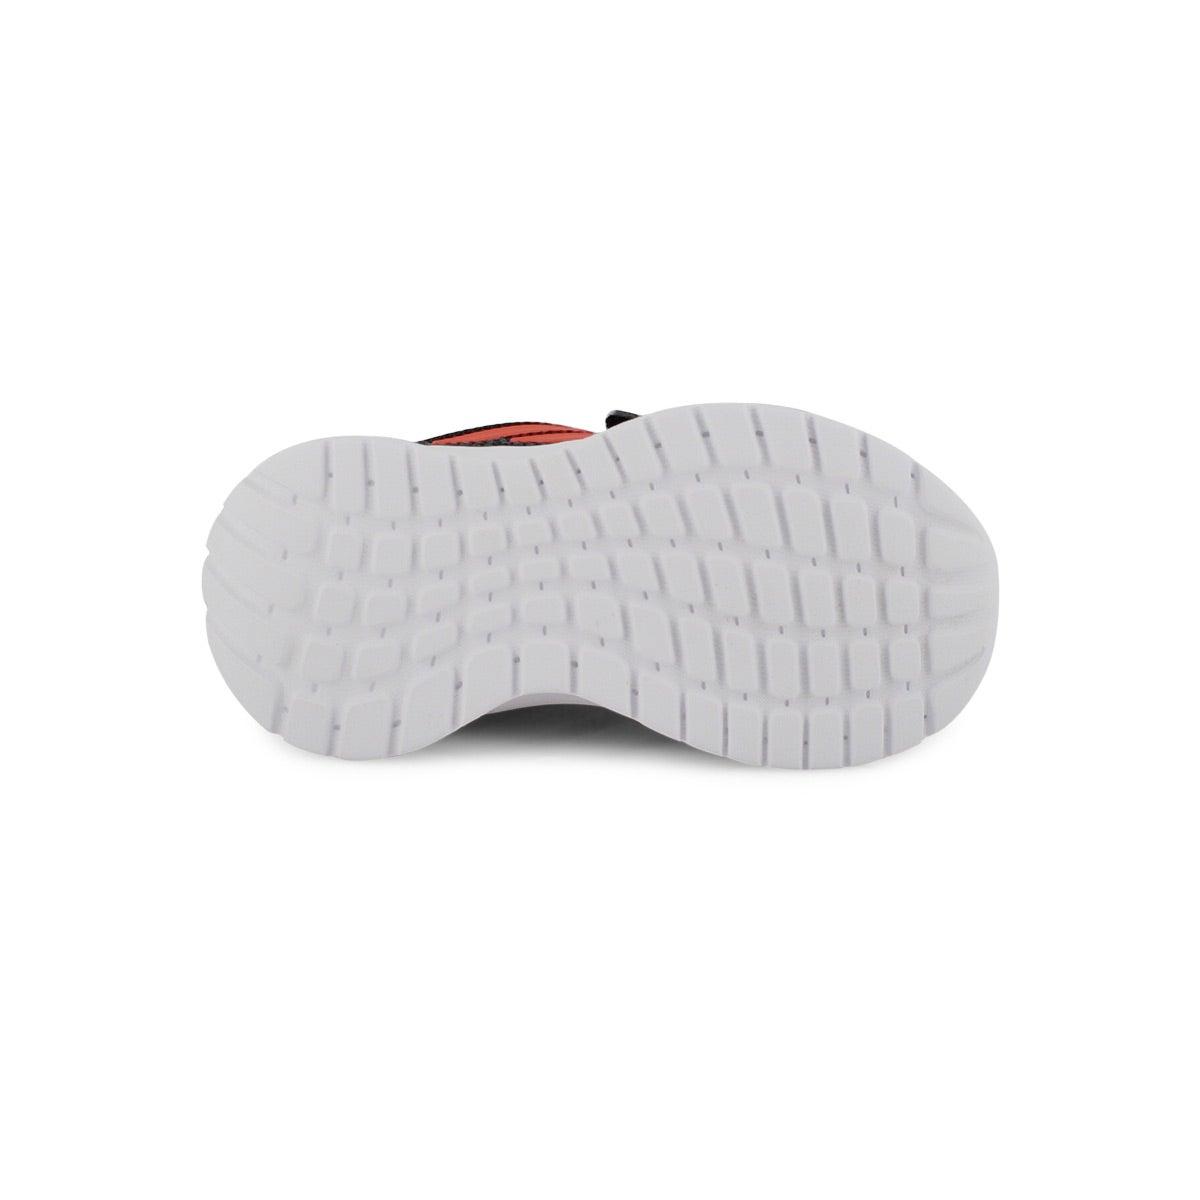 Inf-b Tensaur I black/red/grey sneaker